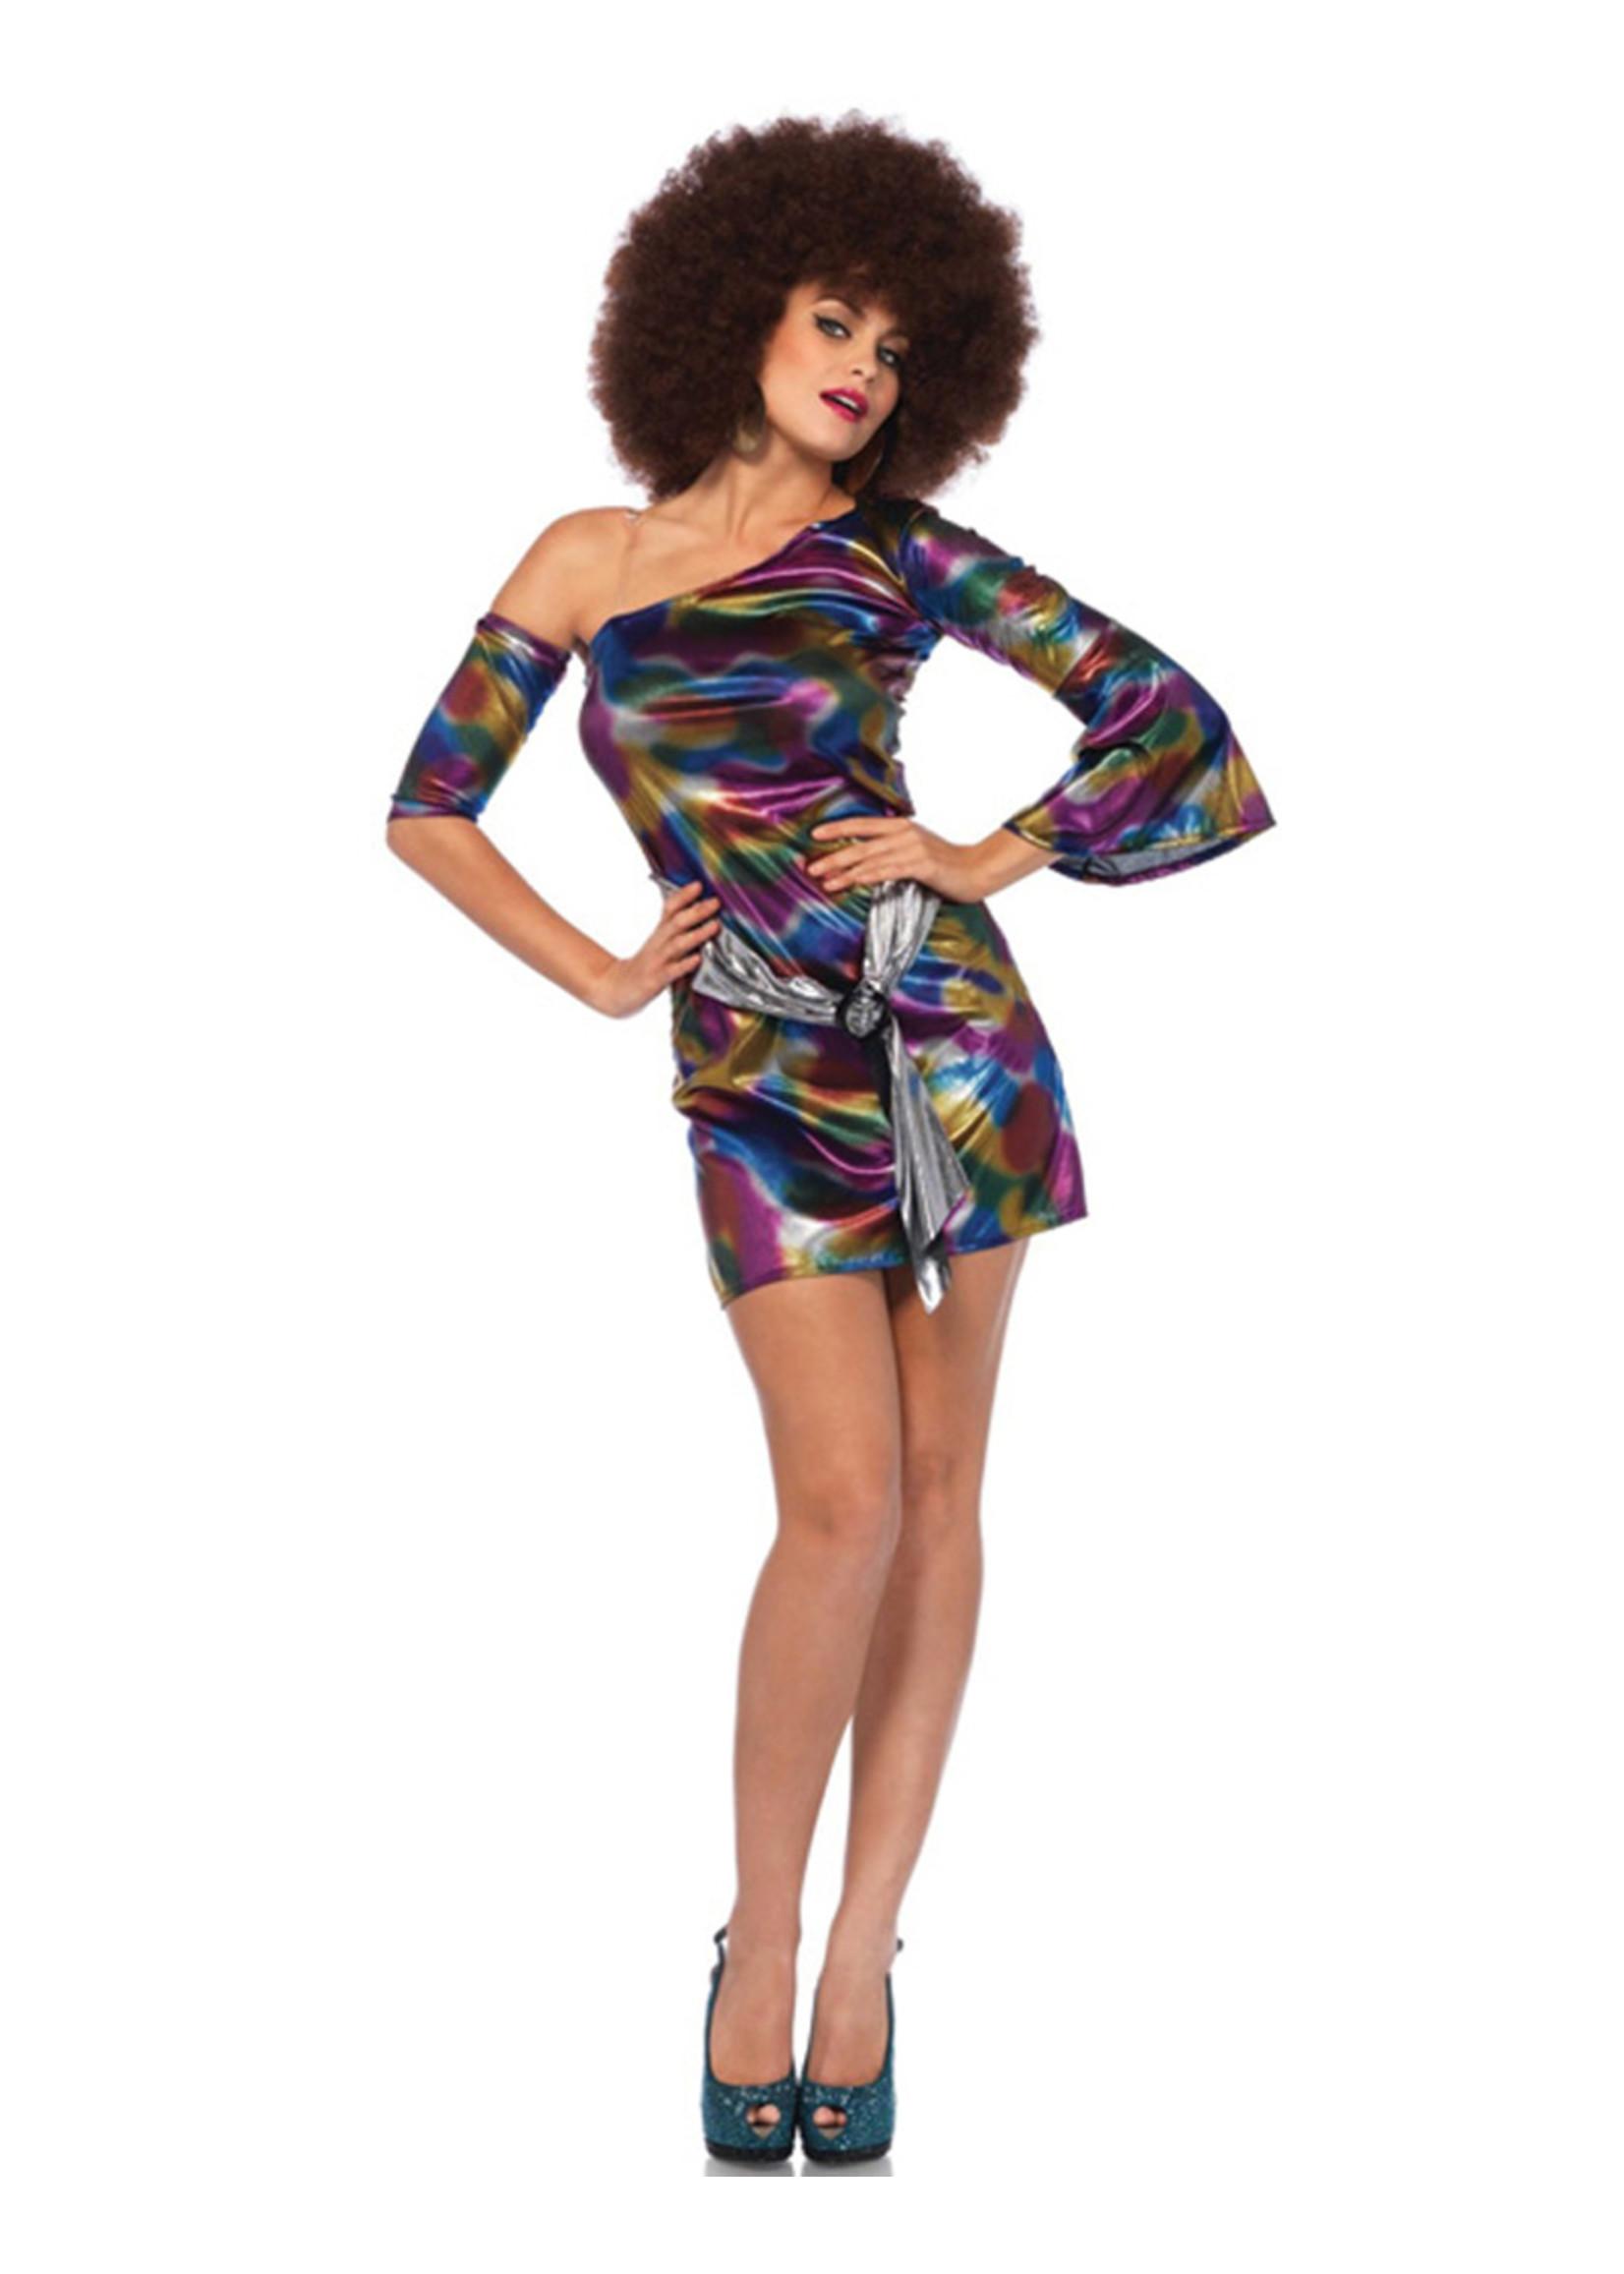 Disco Doll Costume - Women's